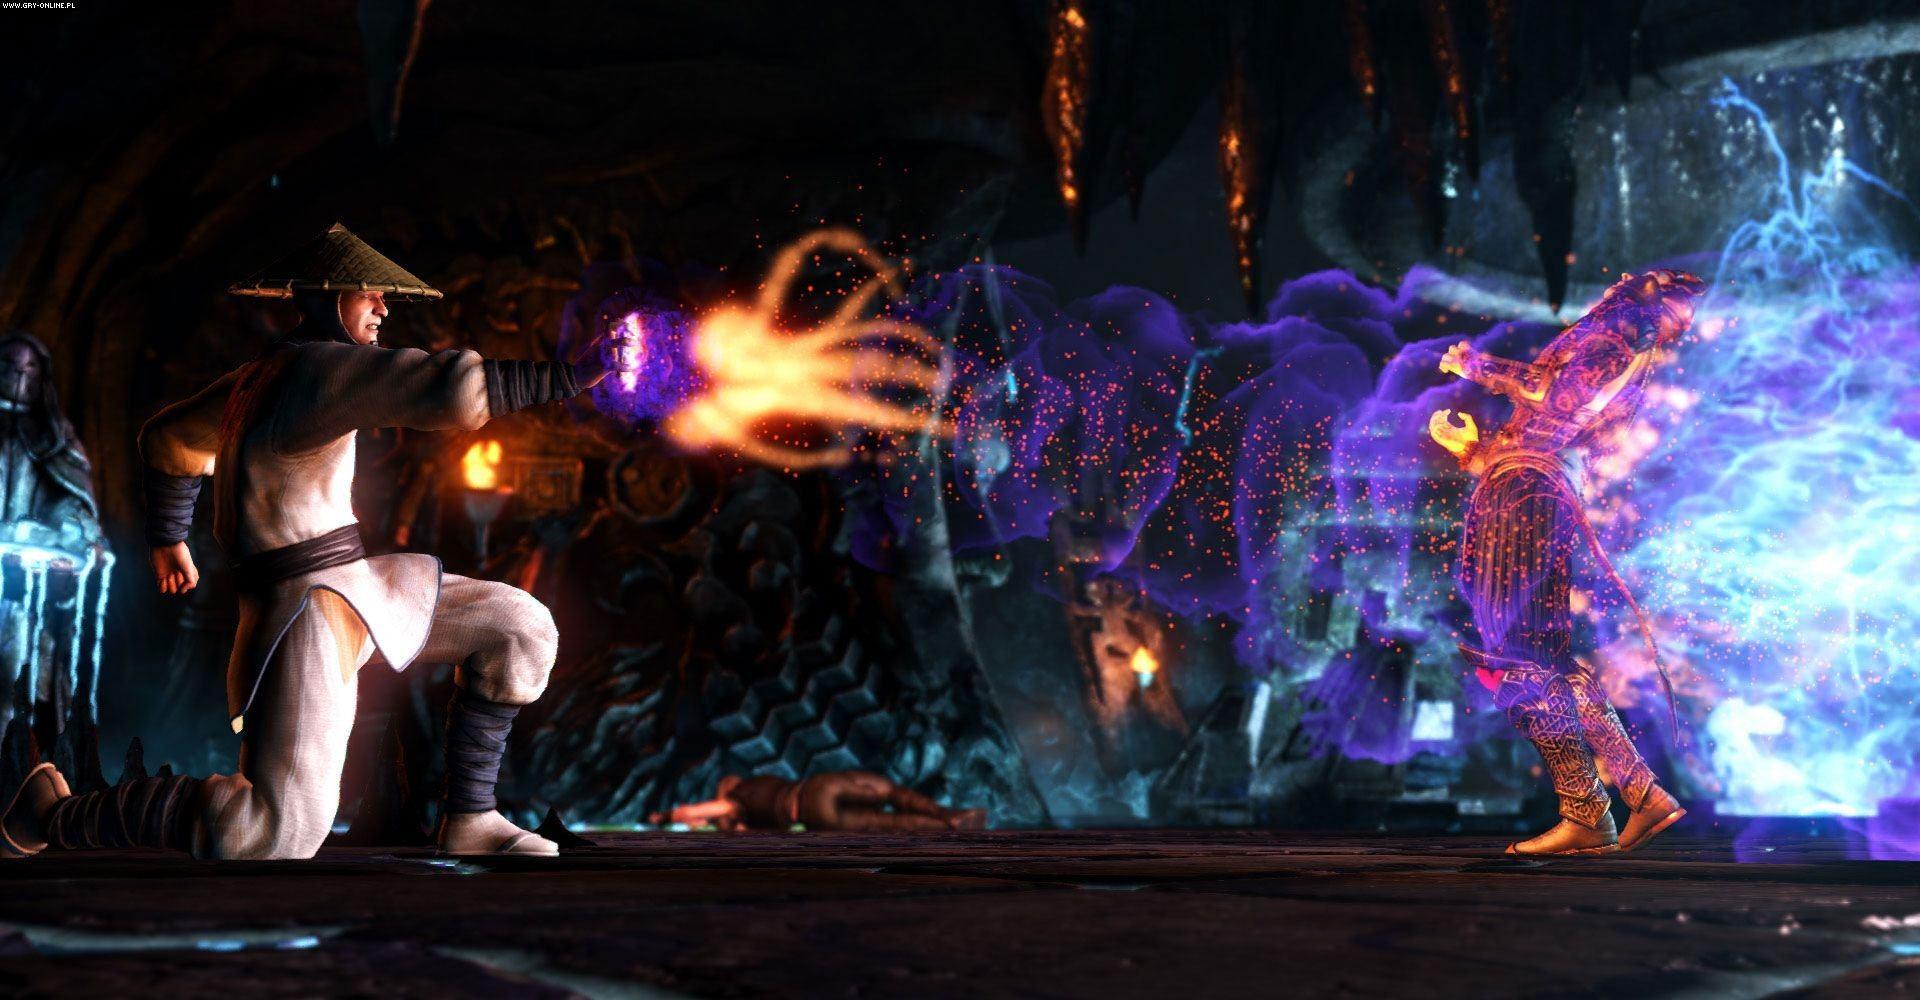 Mortal Kombat X image #3